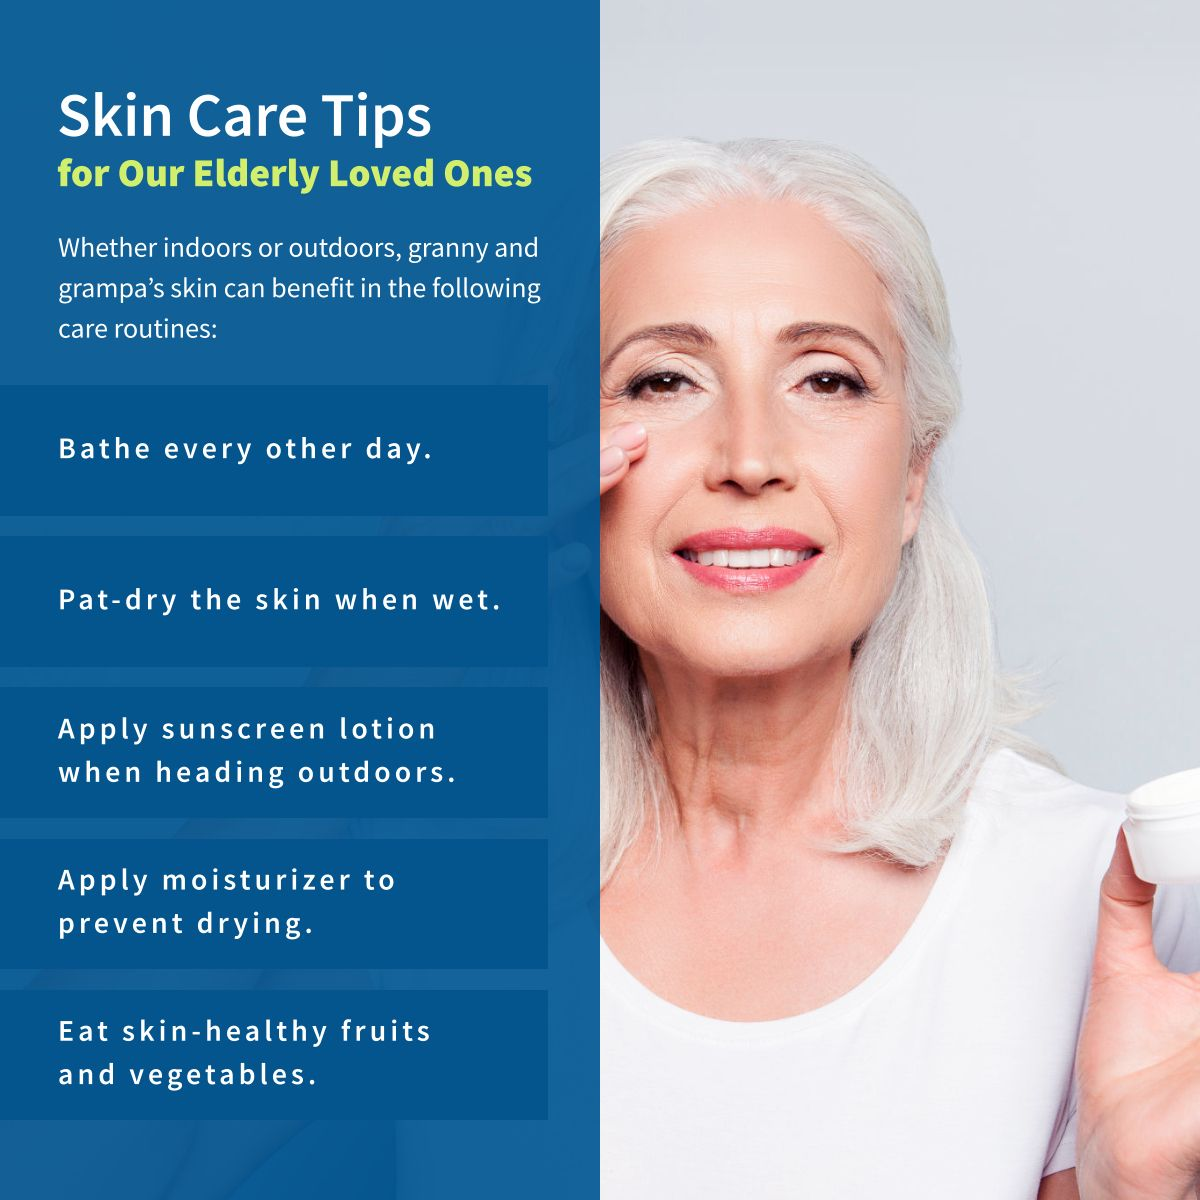 Skin Care Tips For Our Elderly Loved Ones Skincaretips Magnoliahomecareservice Elderly Care Skin Care Tips Understanding Dementia